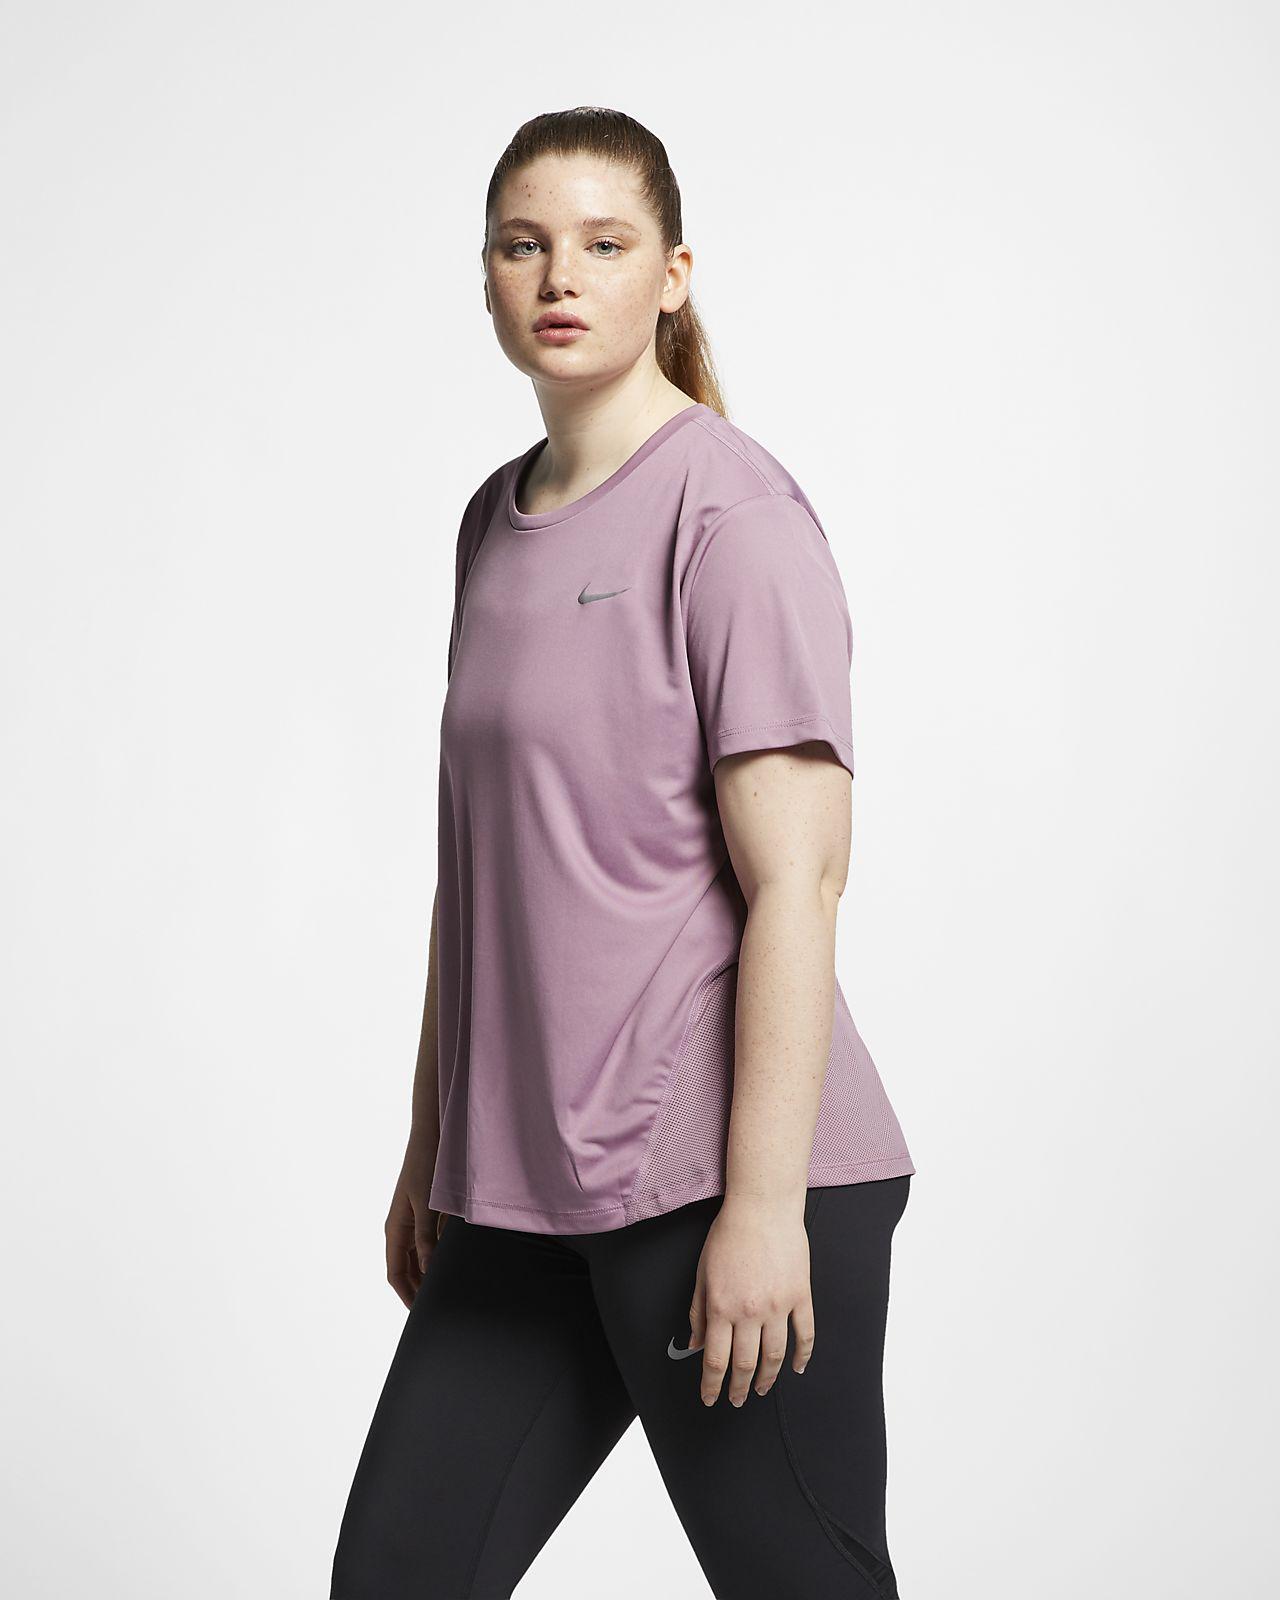 609776b1a89 Nike Miler Women s Short-Sleeve Running Top (Plus Size). Nike.com CA